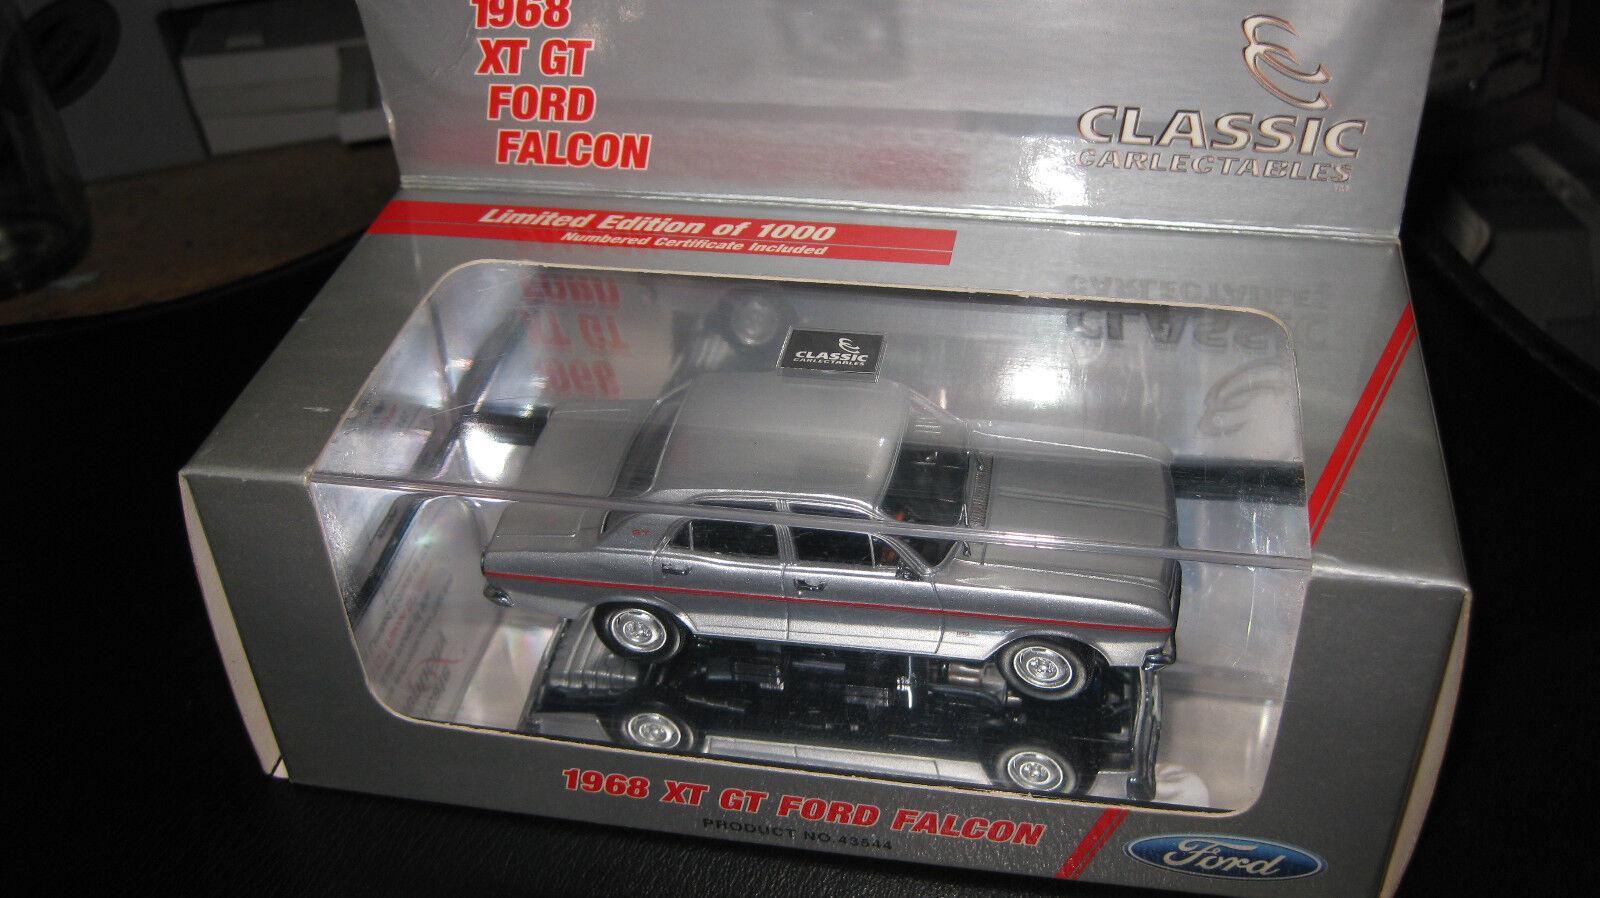 aquí tiene la última CLASSIC CLARLECTIBLES 1 43 FORD FALCON XT GT plata plata plata LTD ED OF 1000 43544 RARE L1  venta al por mayor barato